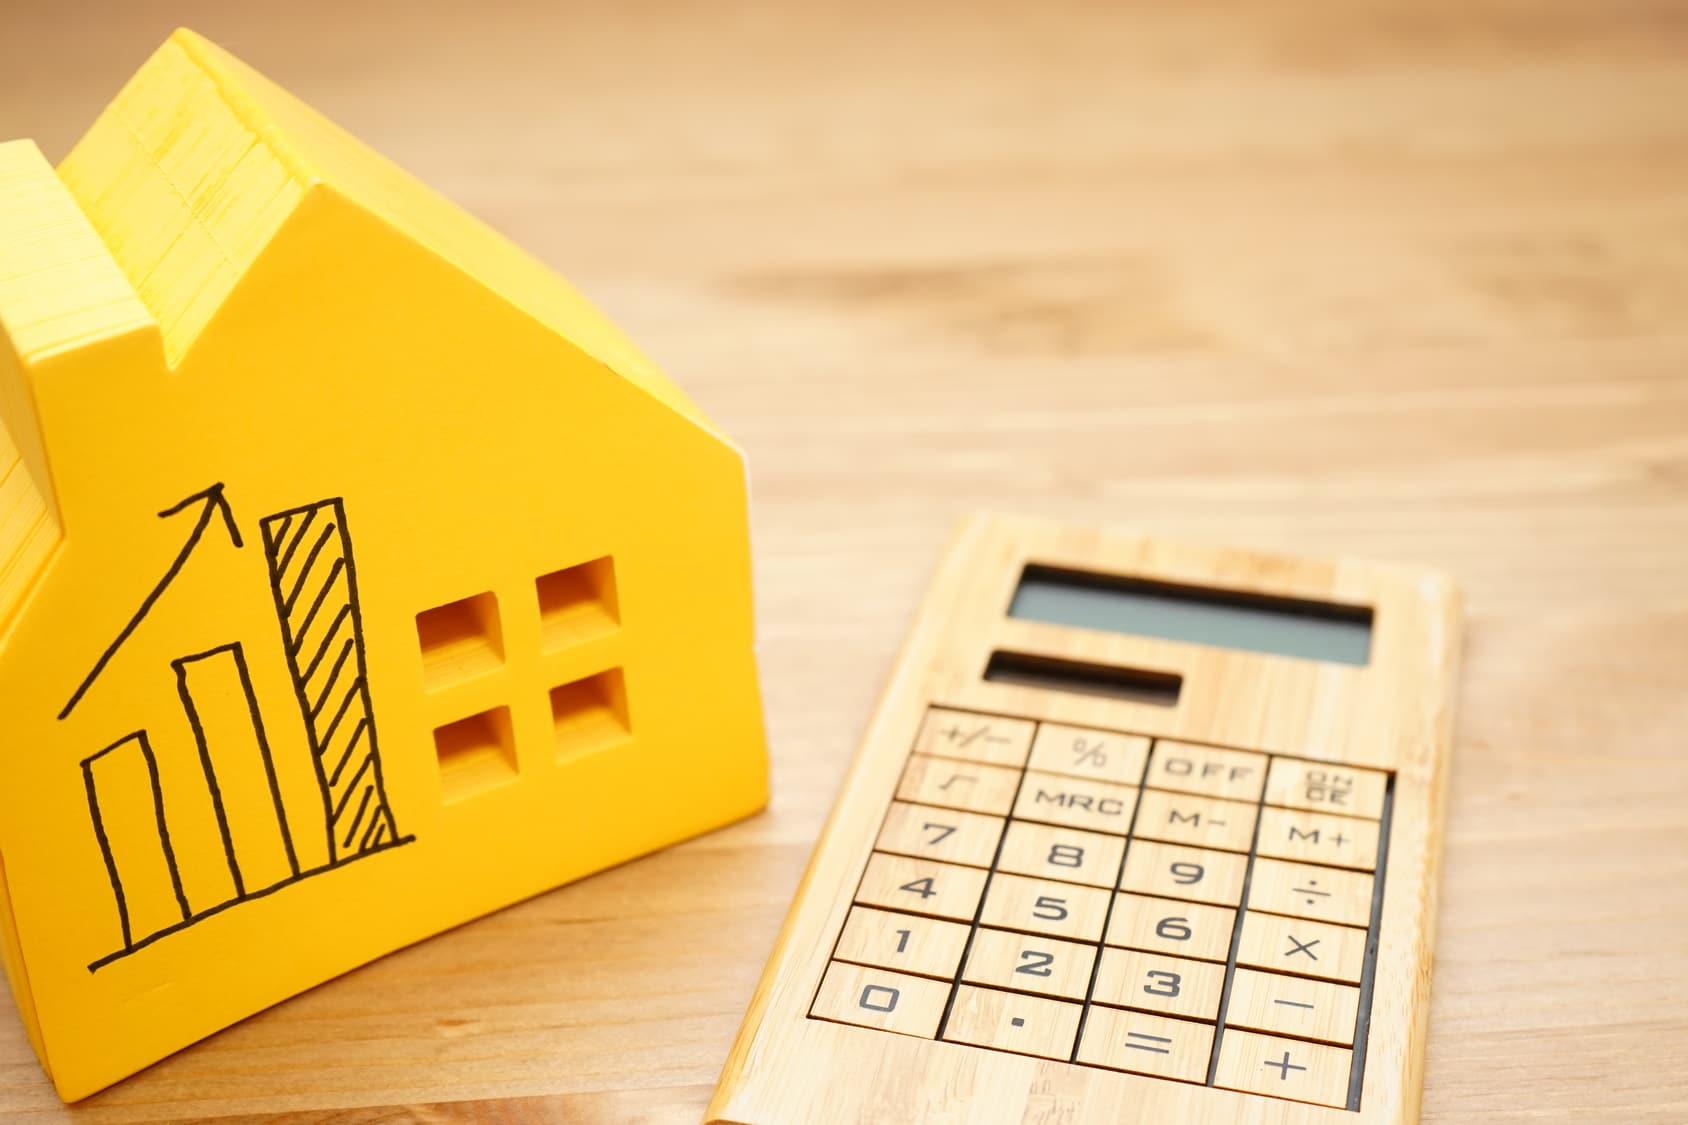 Fha Home Loans Arizona